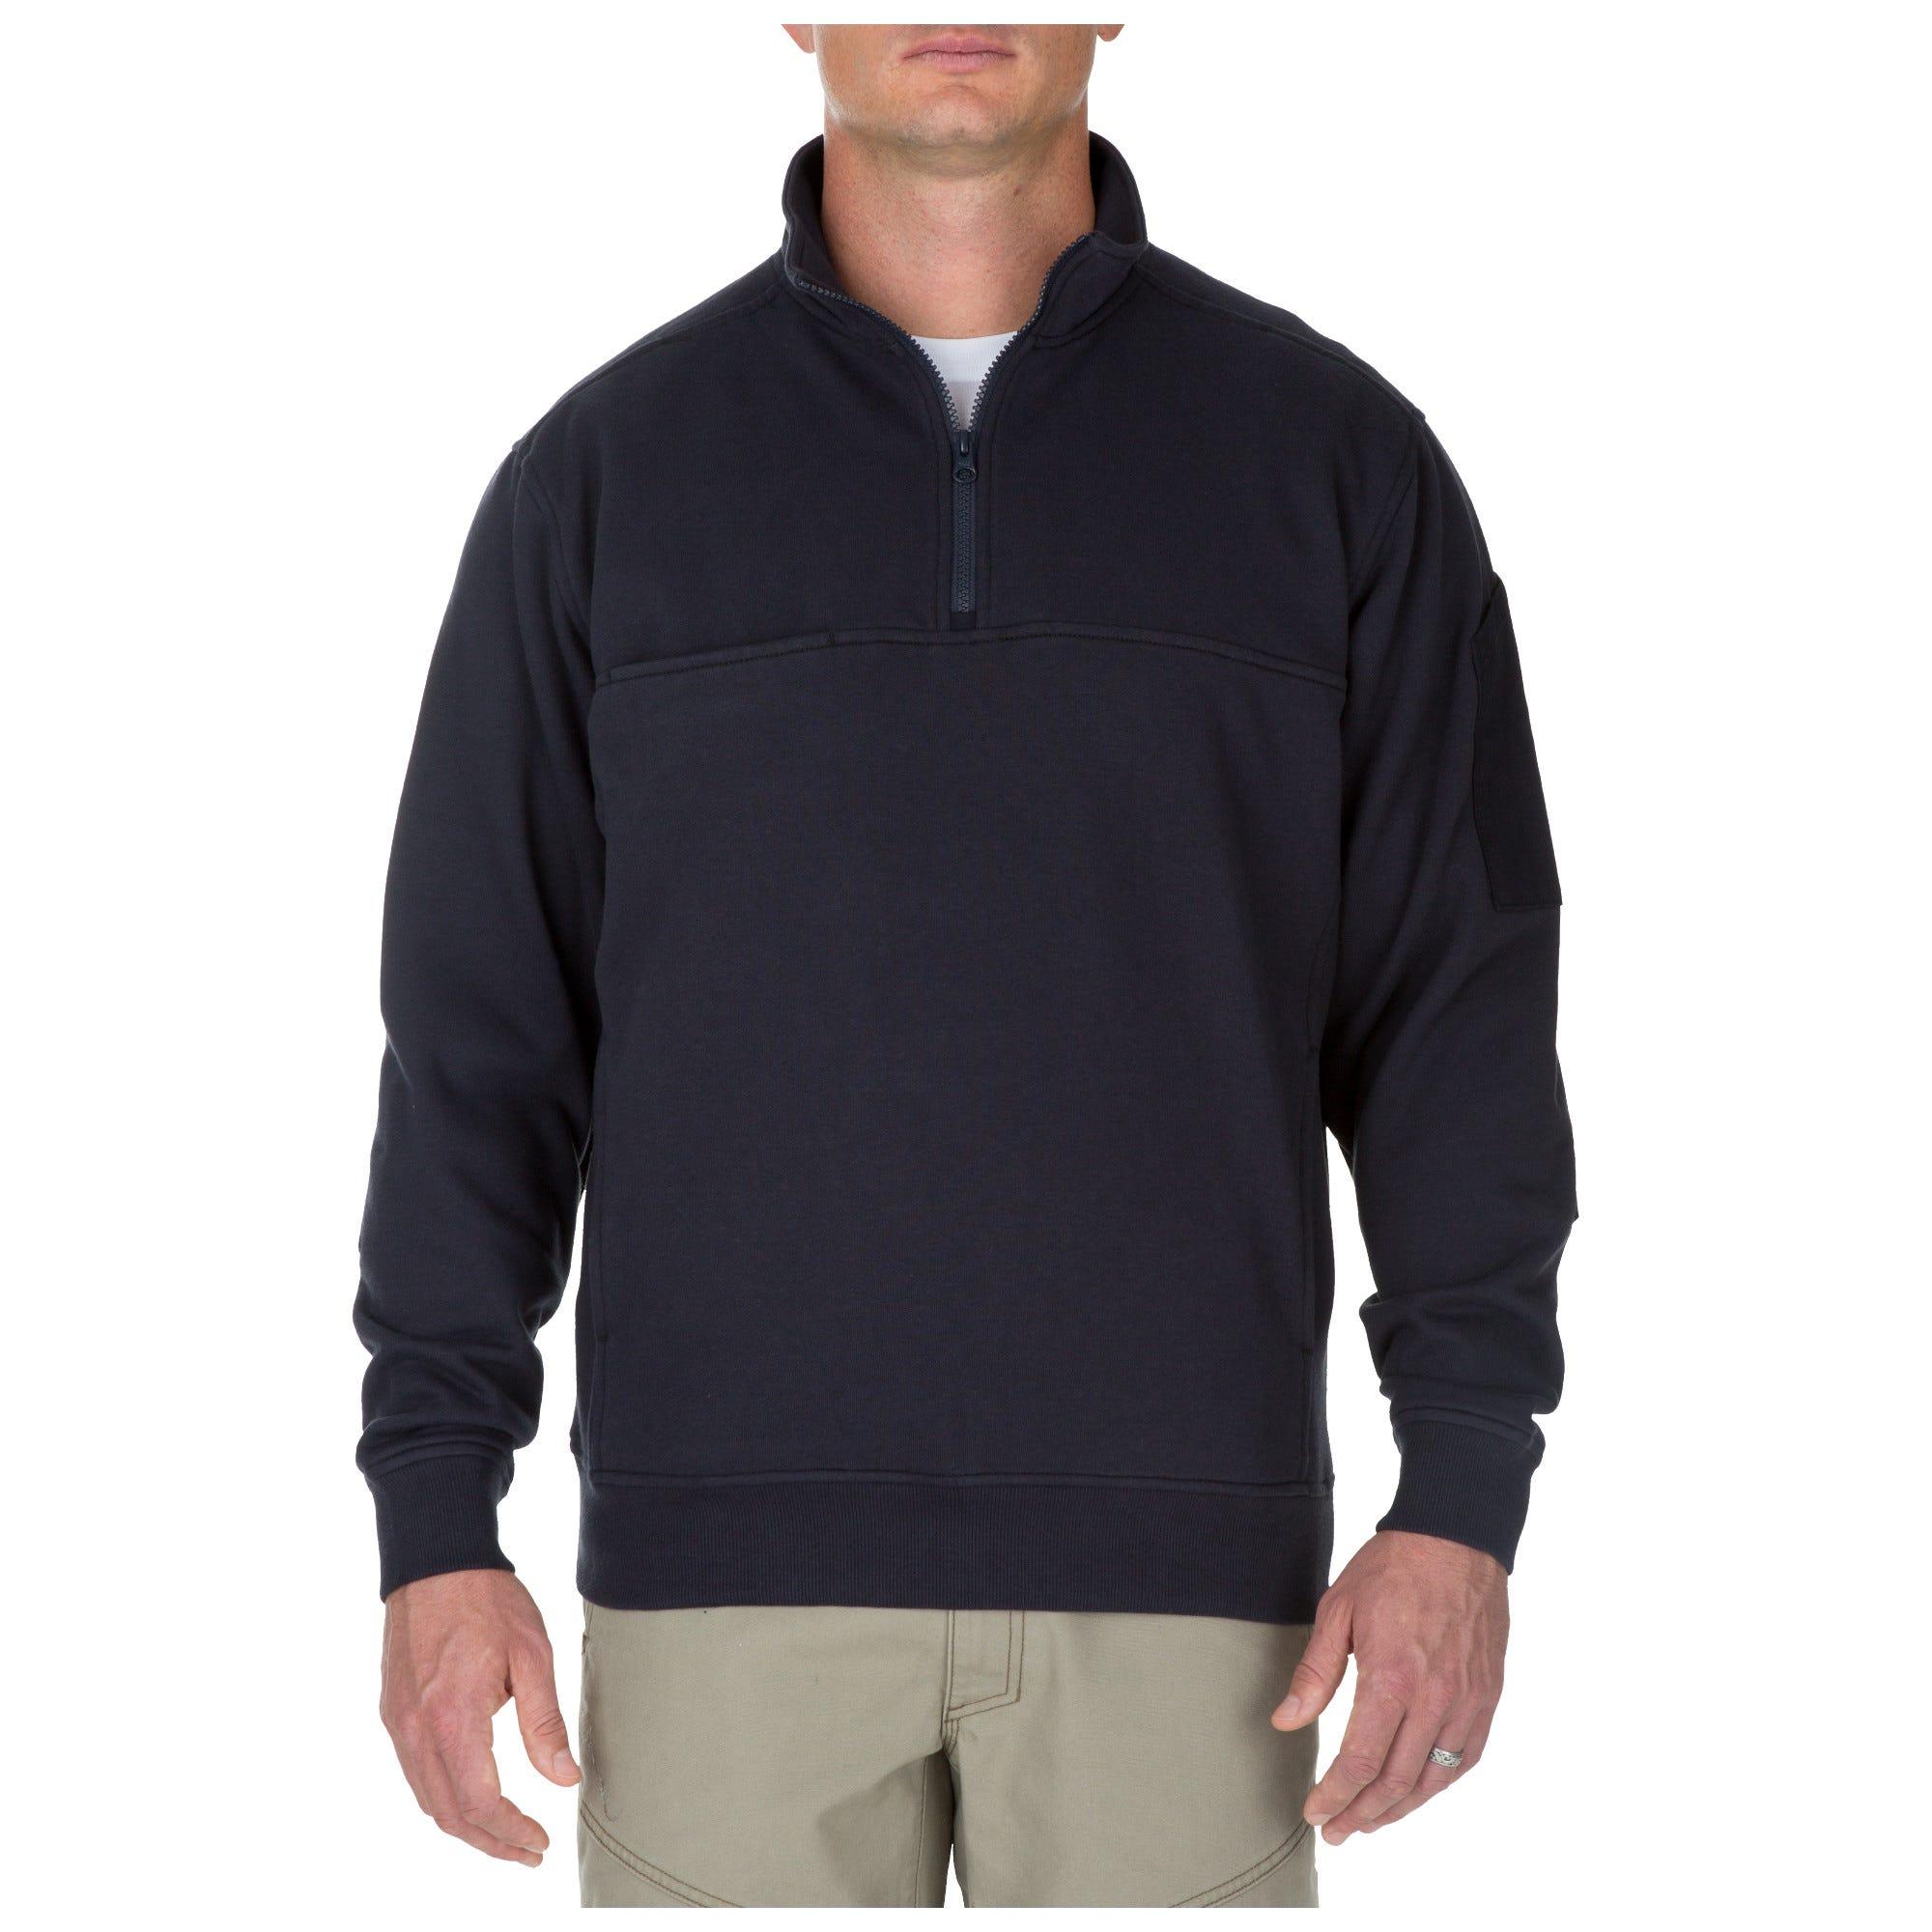 511 Tactical 14 Zip Job Shirt Official 511 Site 511 Tactical